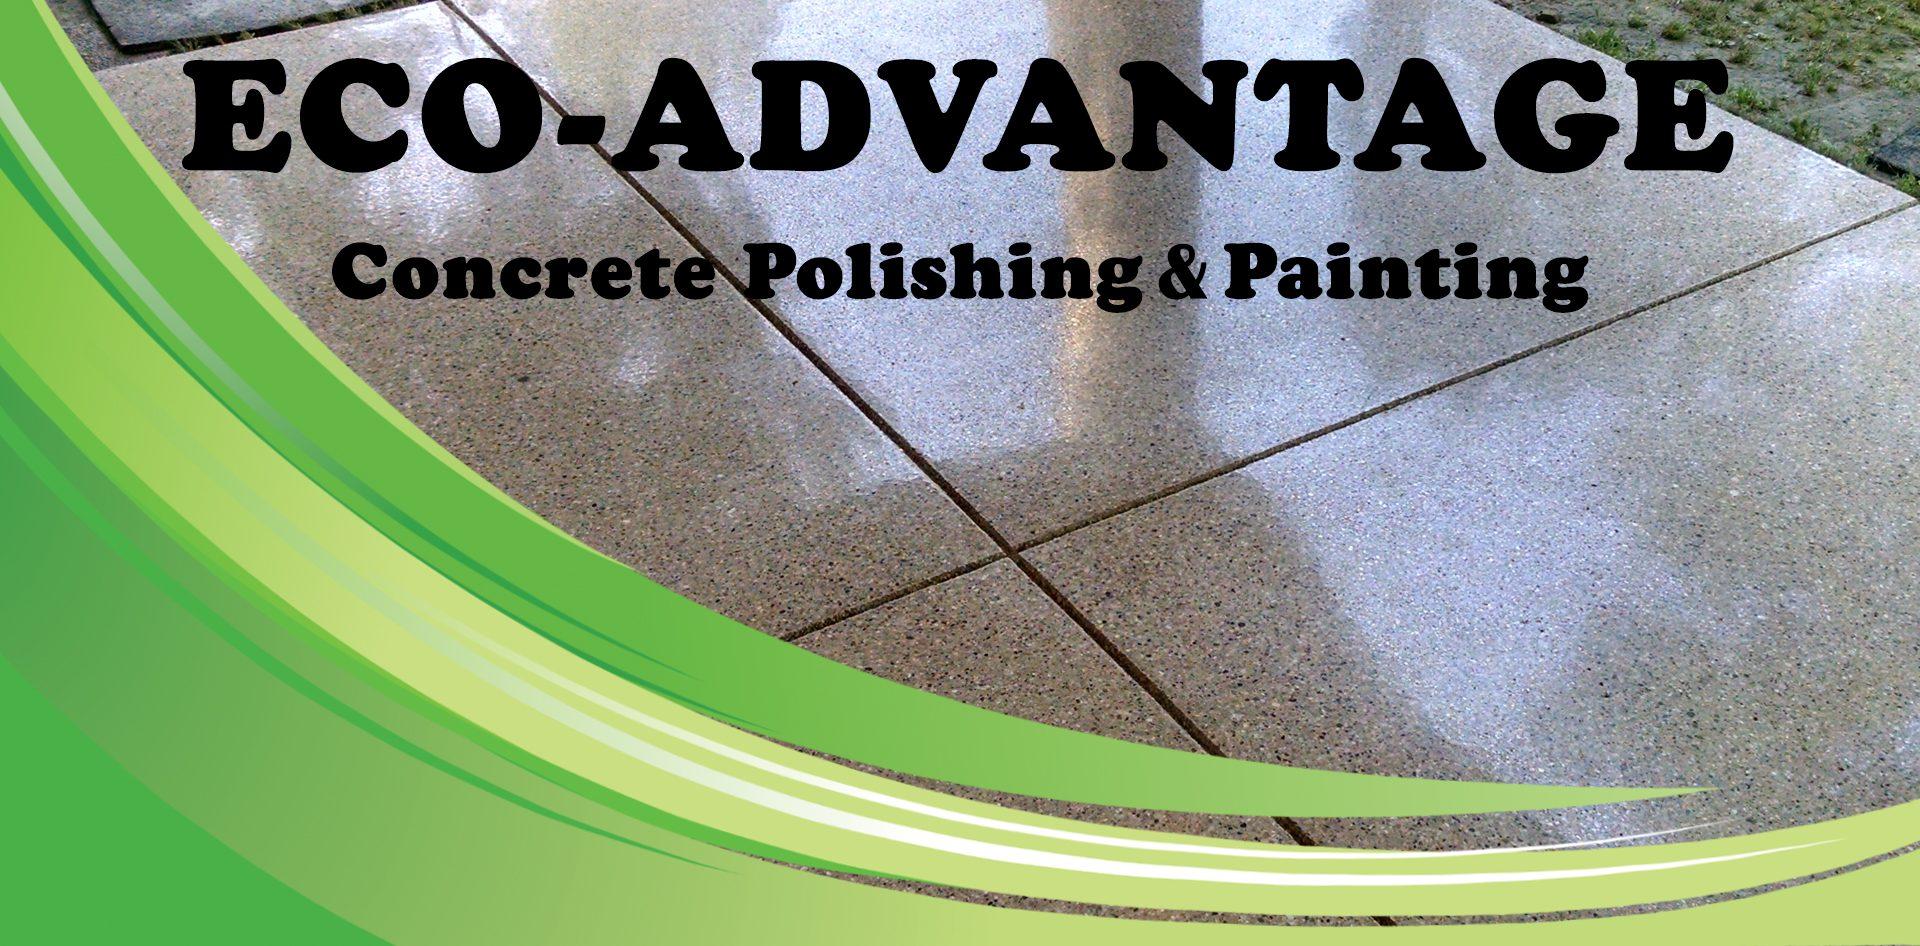 Eco Advantage Concrete Polishing & Painting